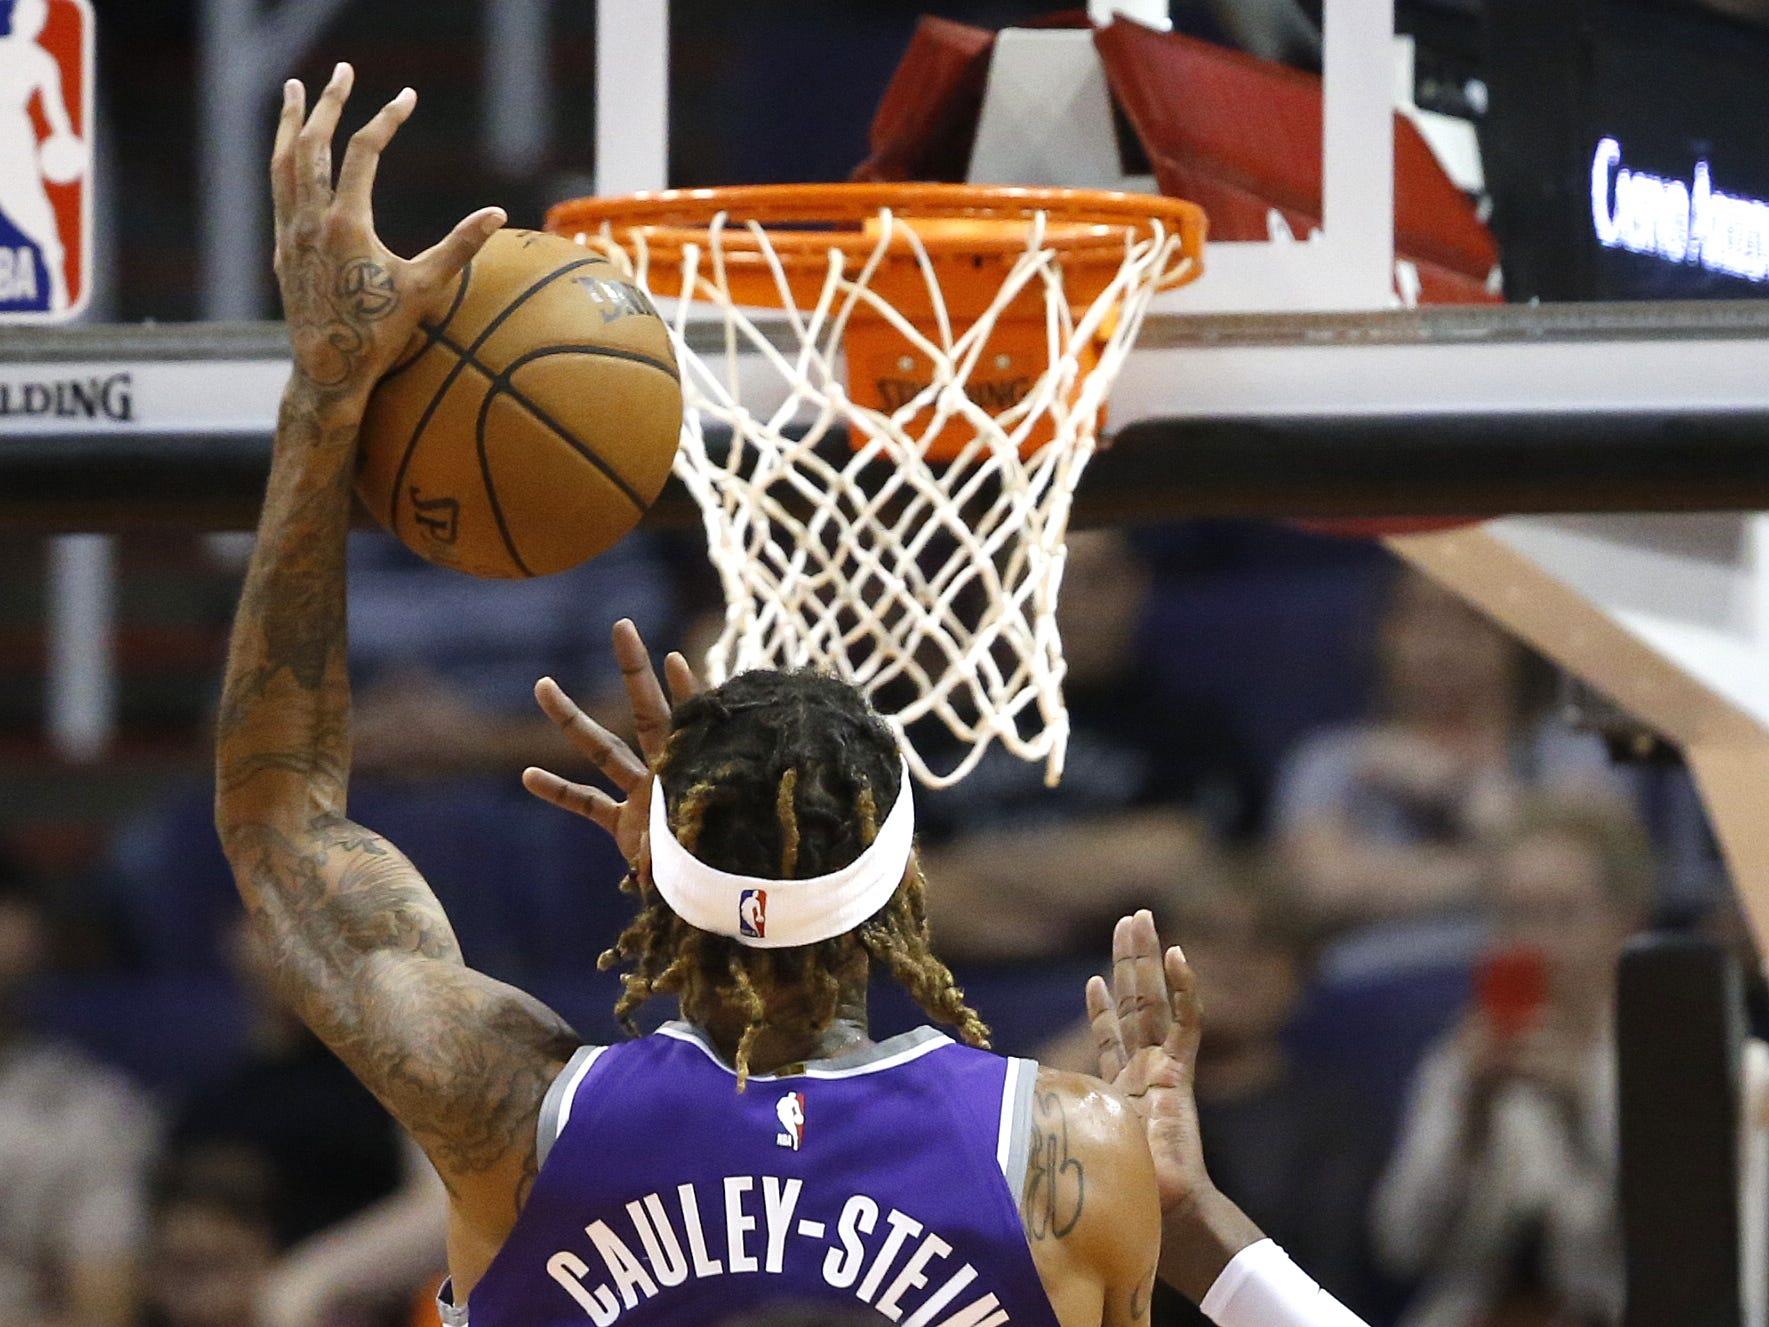 Suns Deandre Ayton (22) blocks Kings Willie Cauley-Stein (00) during the first half at Talking Stick Resort Arena in Phoenix, Ariz. on October 1, 2018.